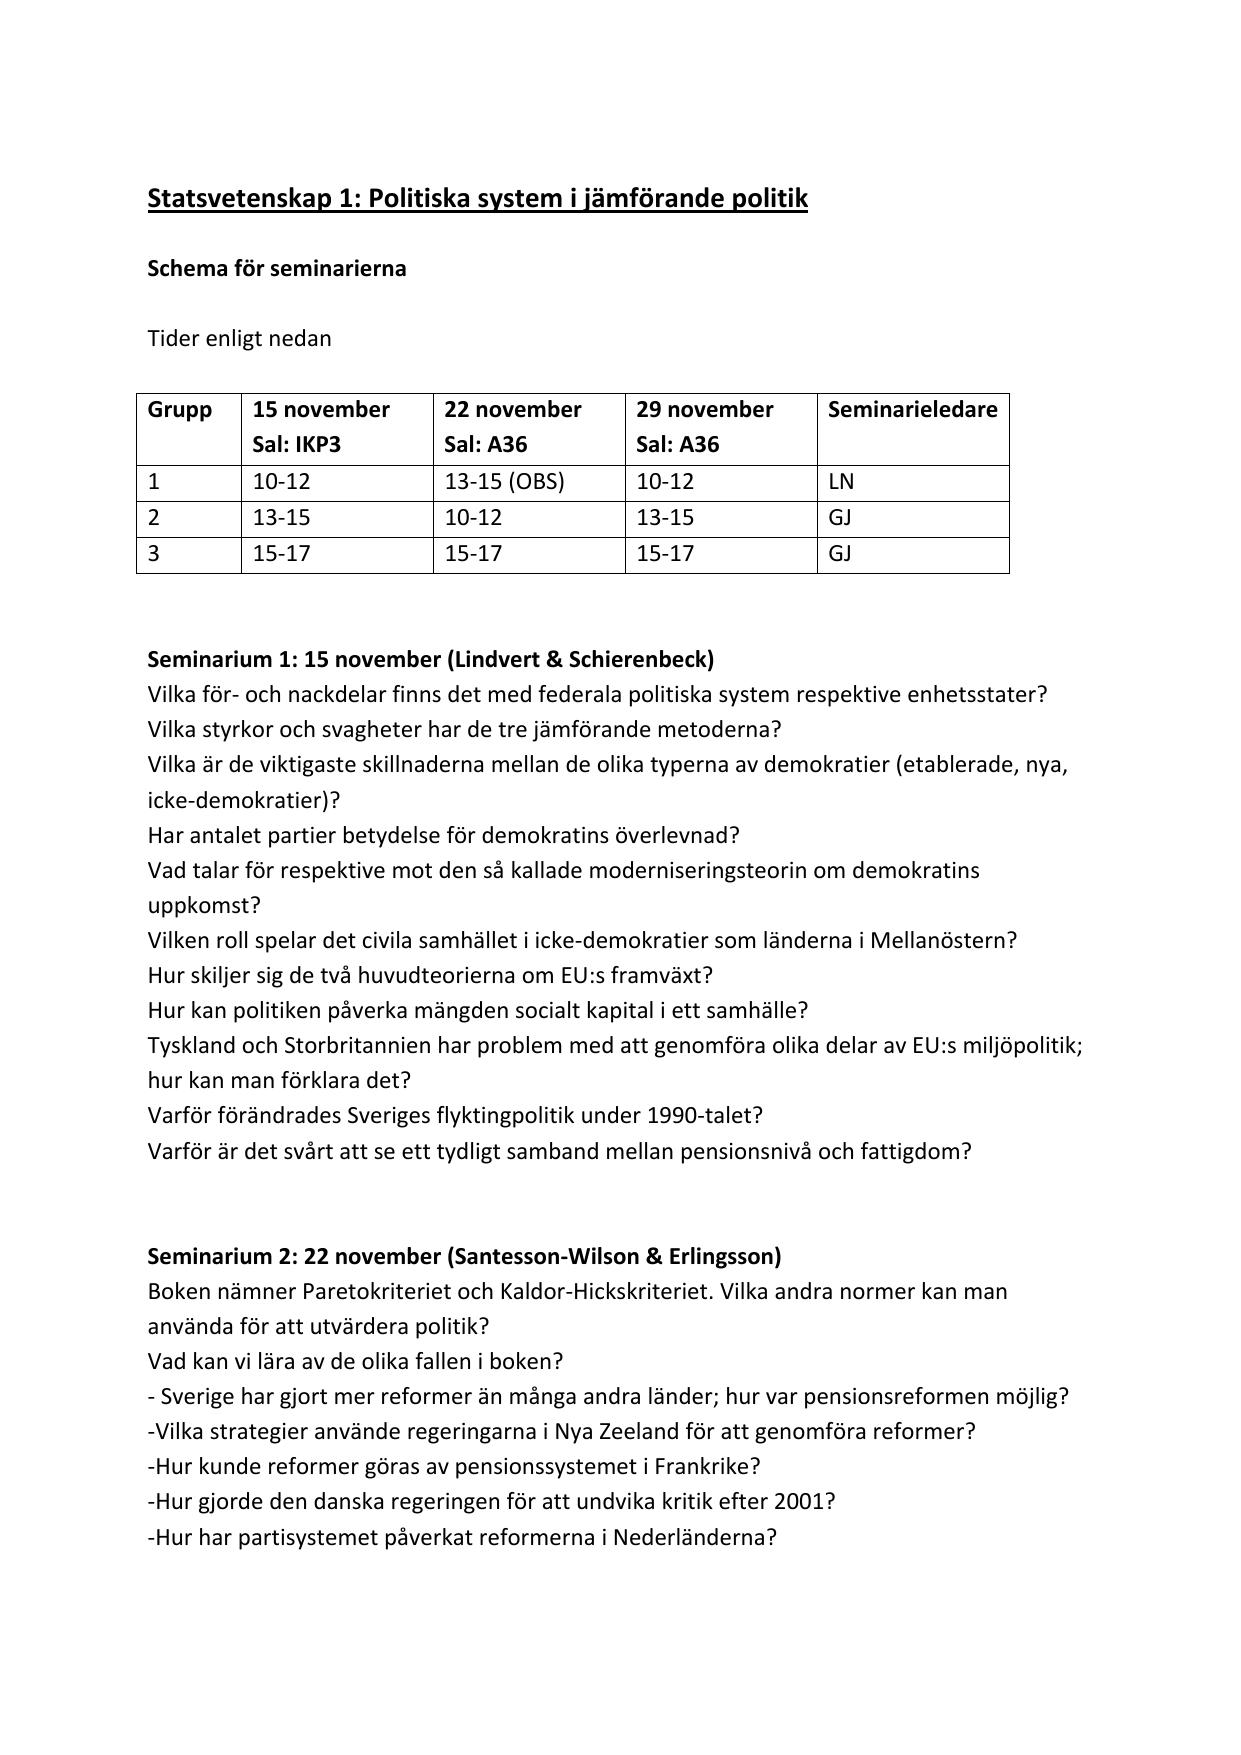 Statsvetenskap 1 Politiska System I Jamforande Politik